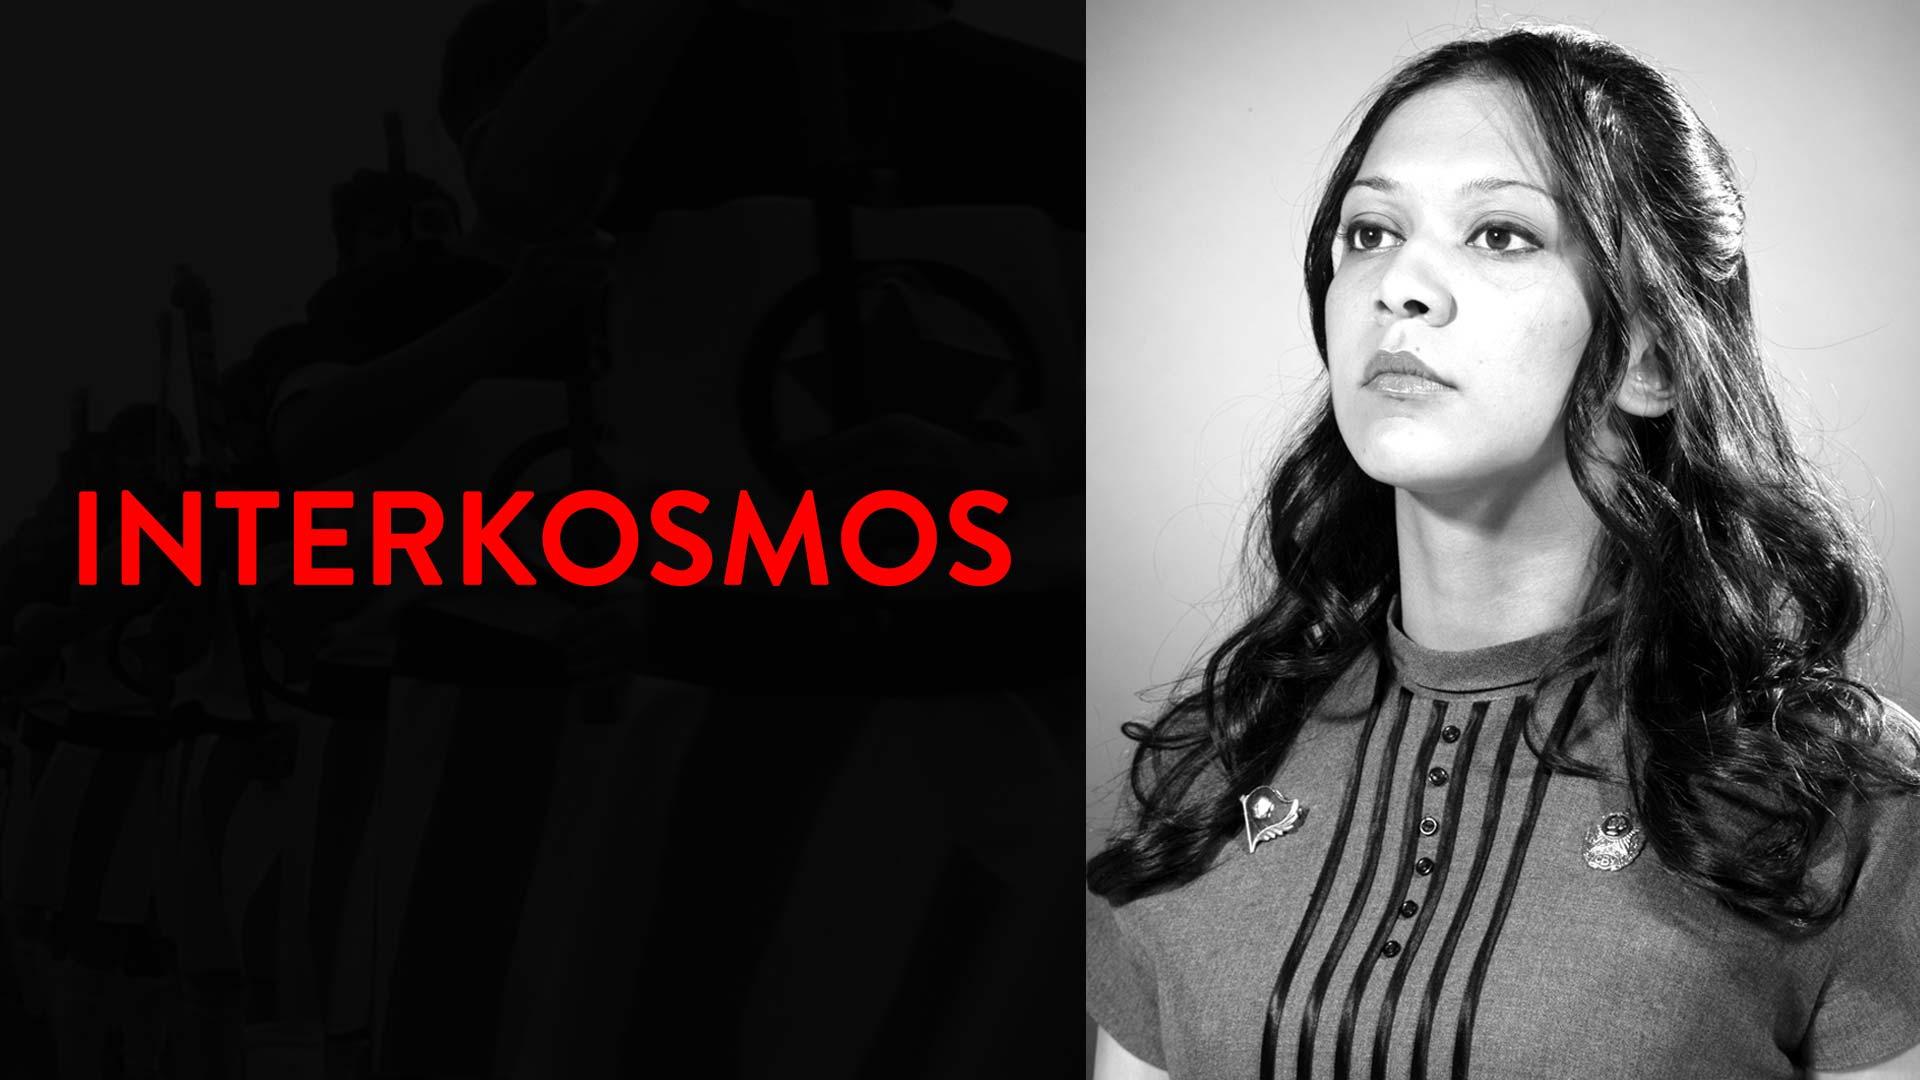 Interkosmos - image